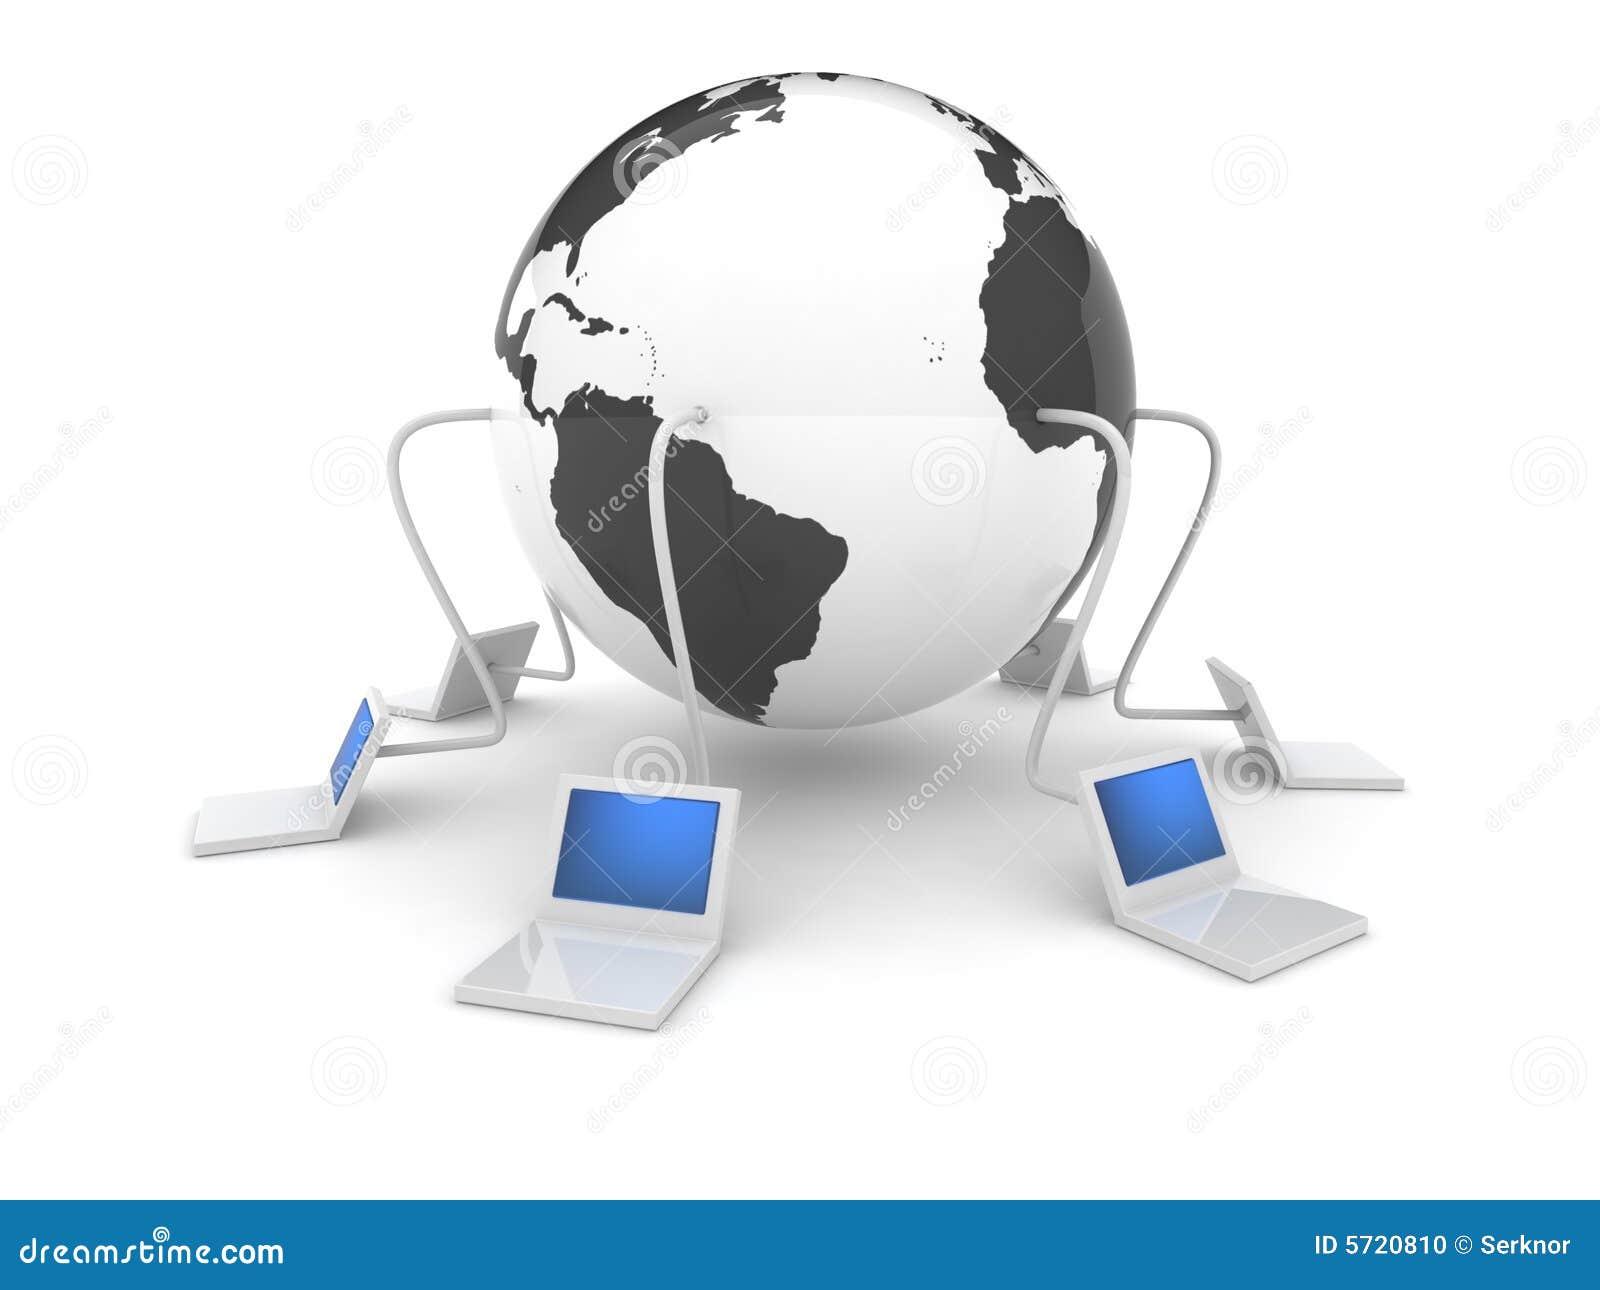 3d web icon - Internet